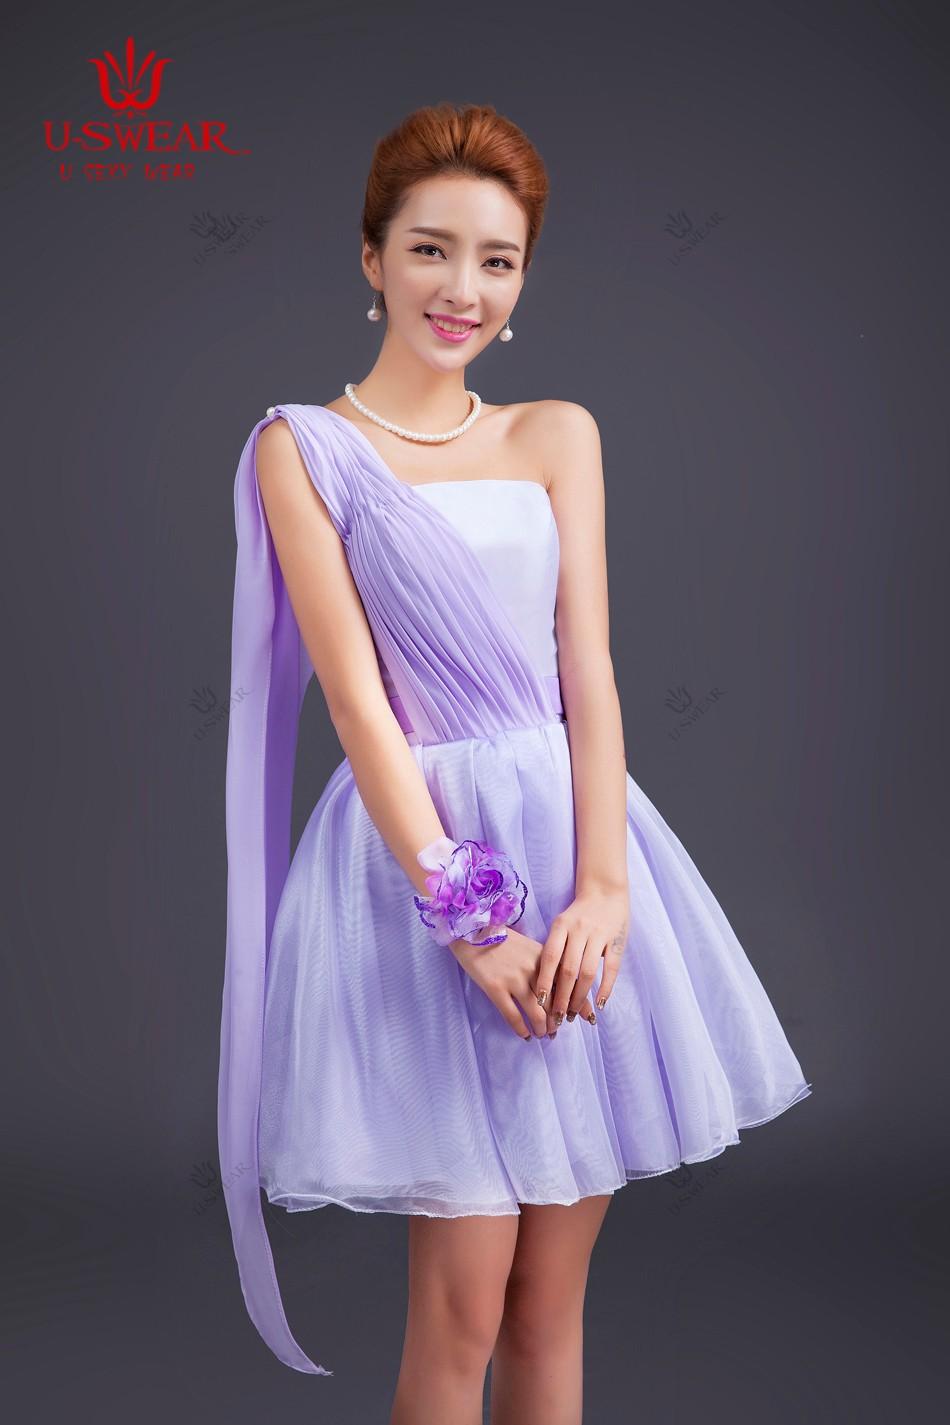 Miedoso Vestido De La Dama De Honor Barata Ideas Ornamento ...